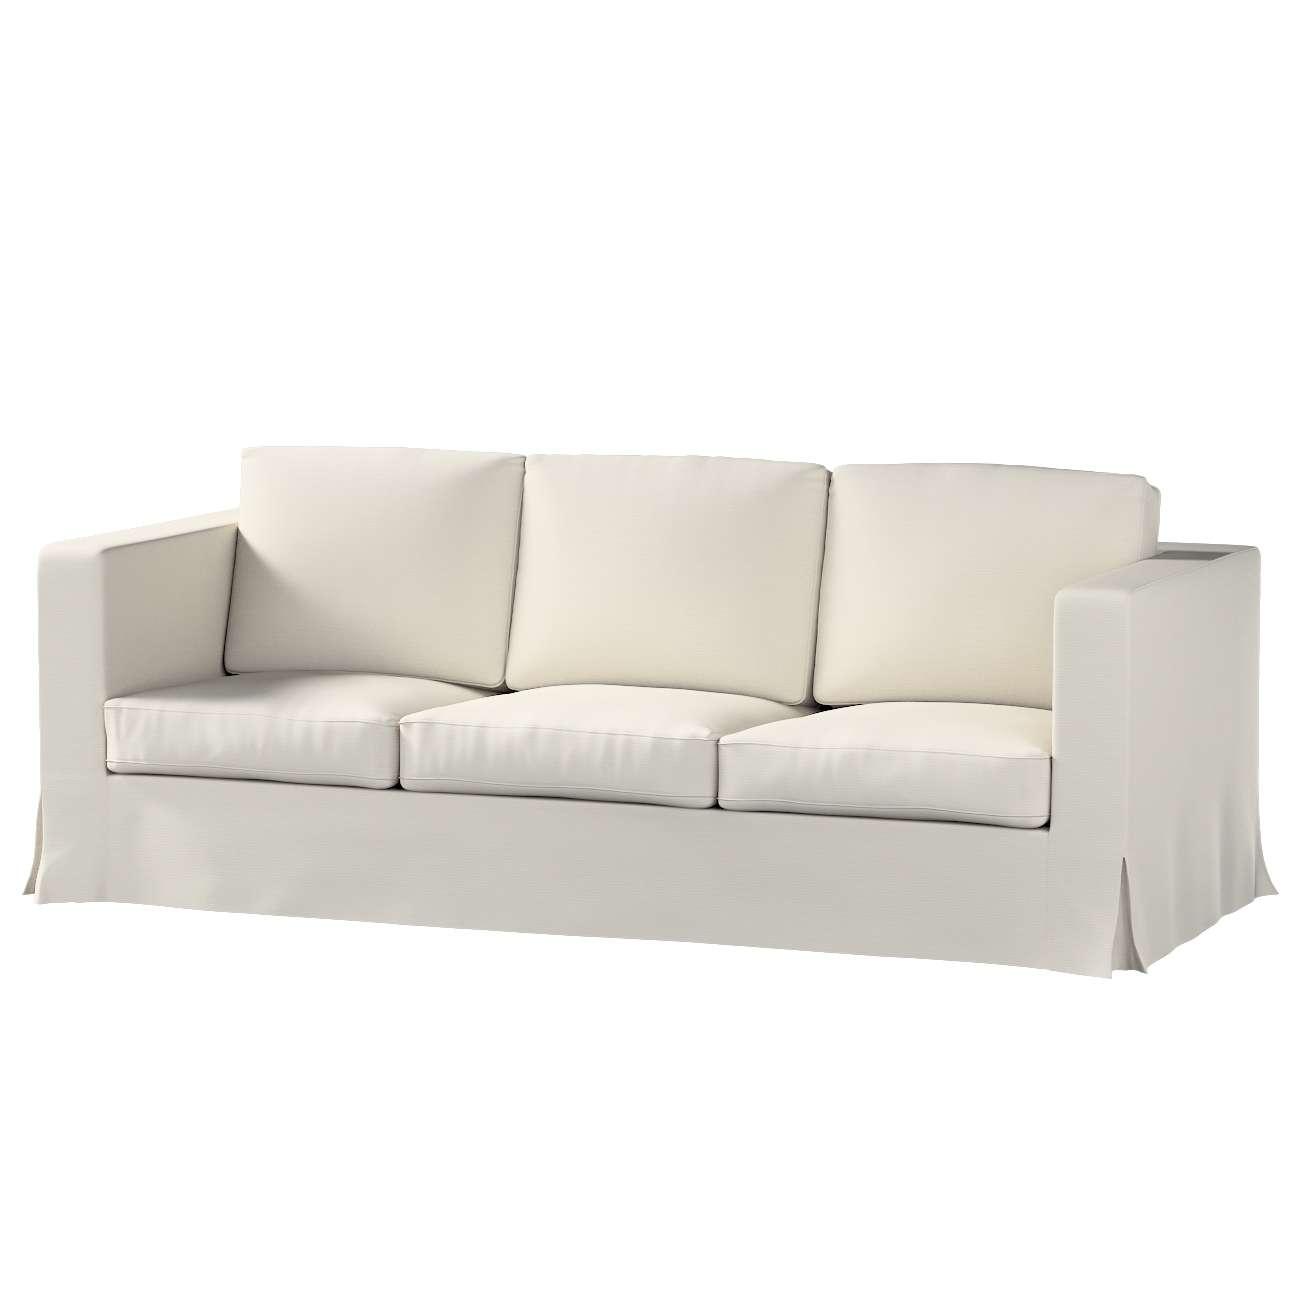 Karlanda klädsel 3-sits soffa - lång i kollektionen Panama Cotton, Tyg: 702-31